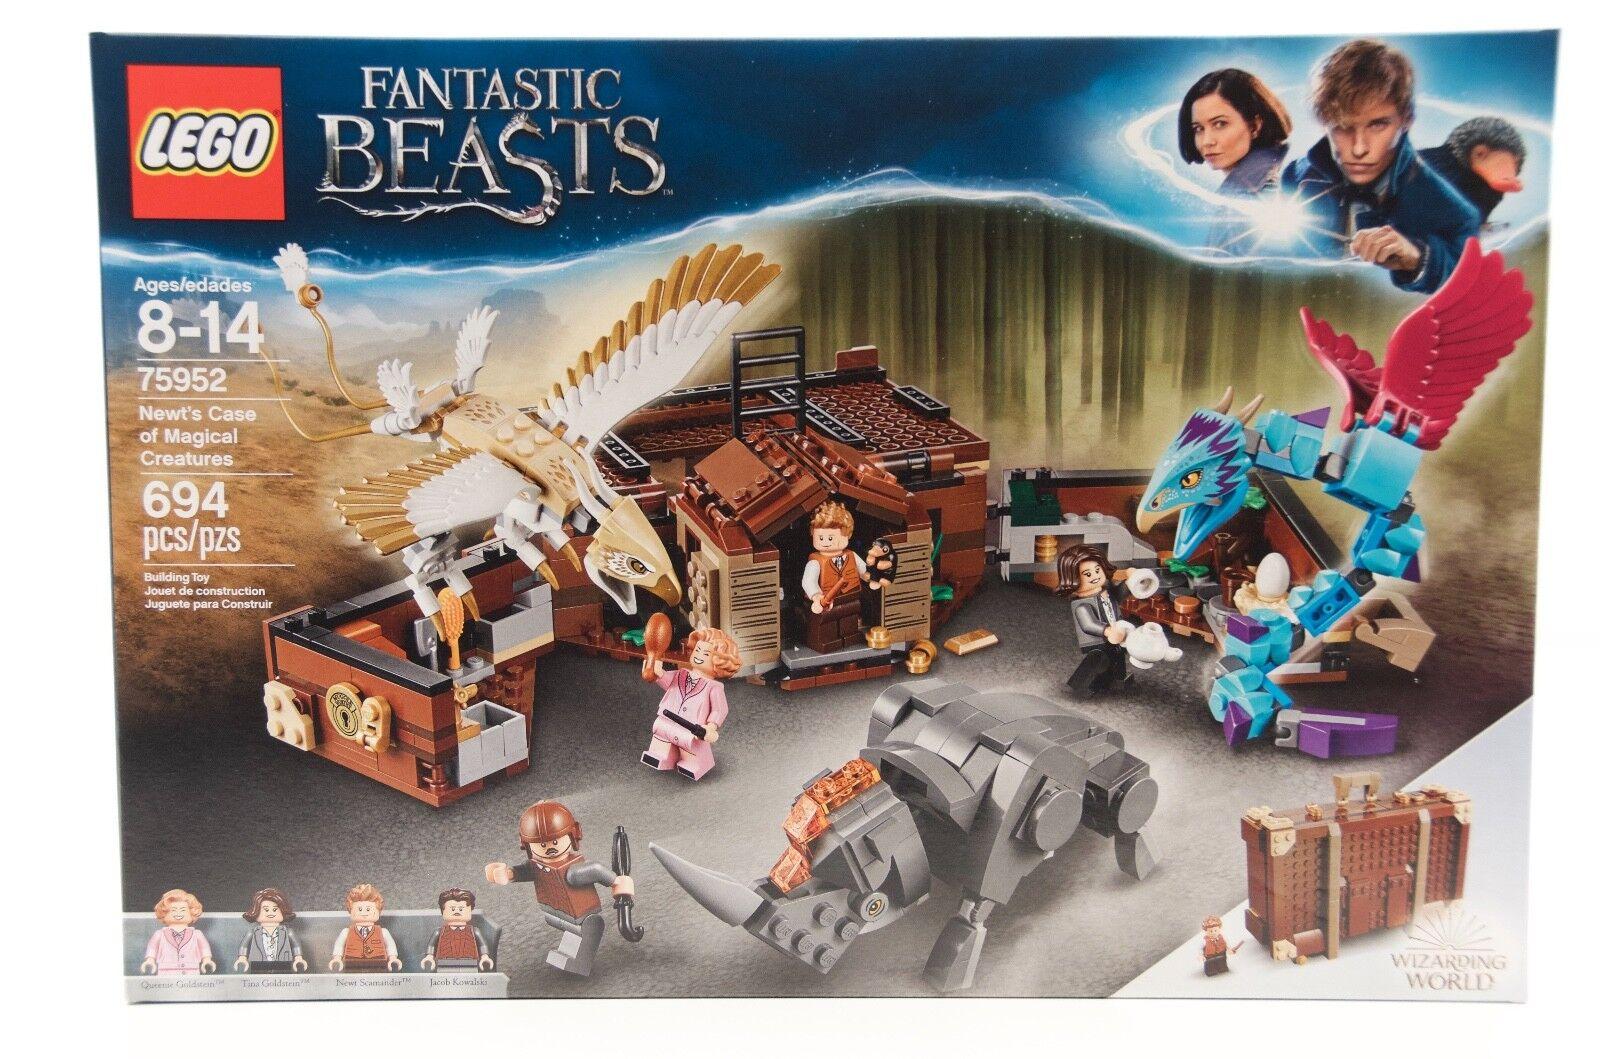 Lego FANTASTIC BEASTS 75952 nuovot's Case of Magical Creatures  694 PCS Ages 8 & Up  servizio premuroso